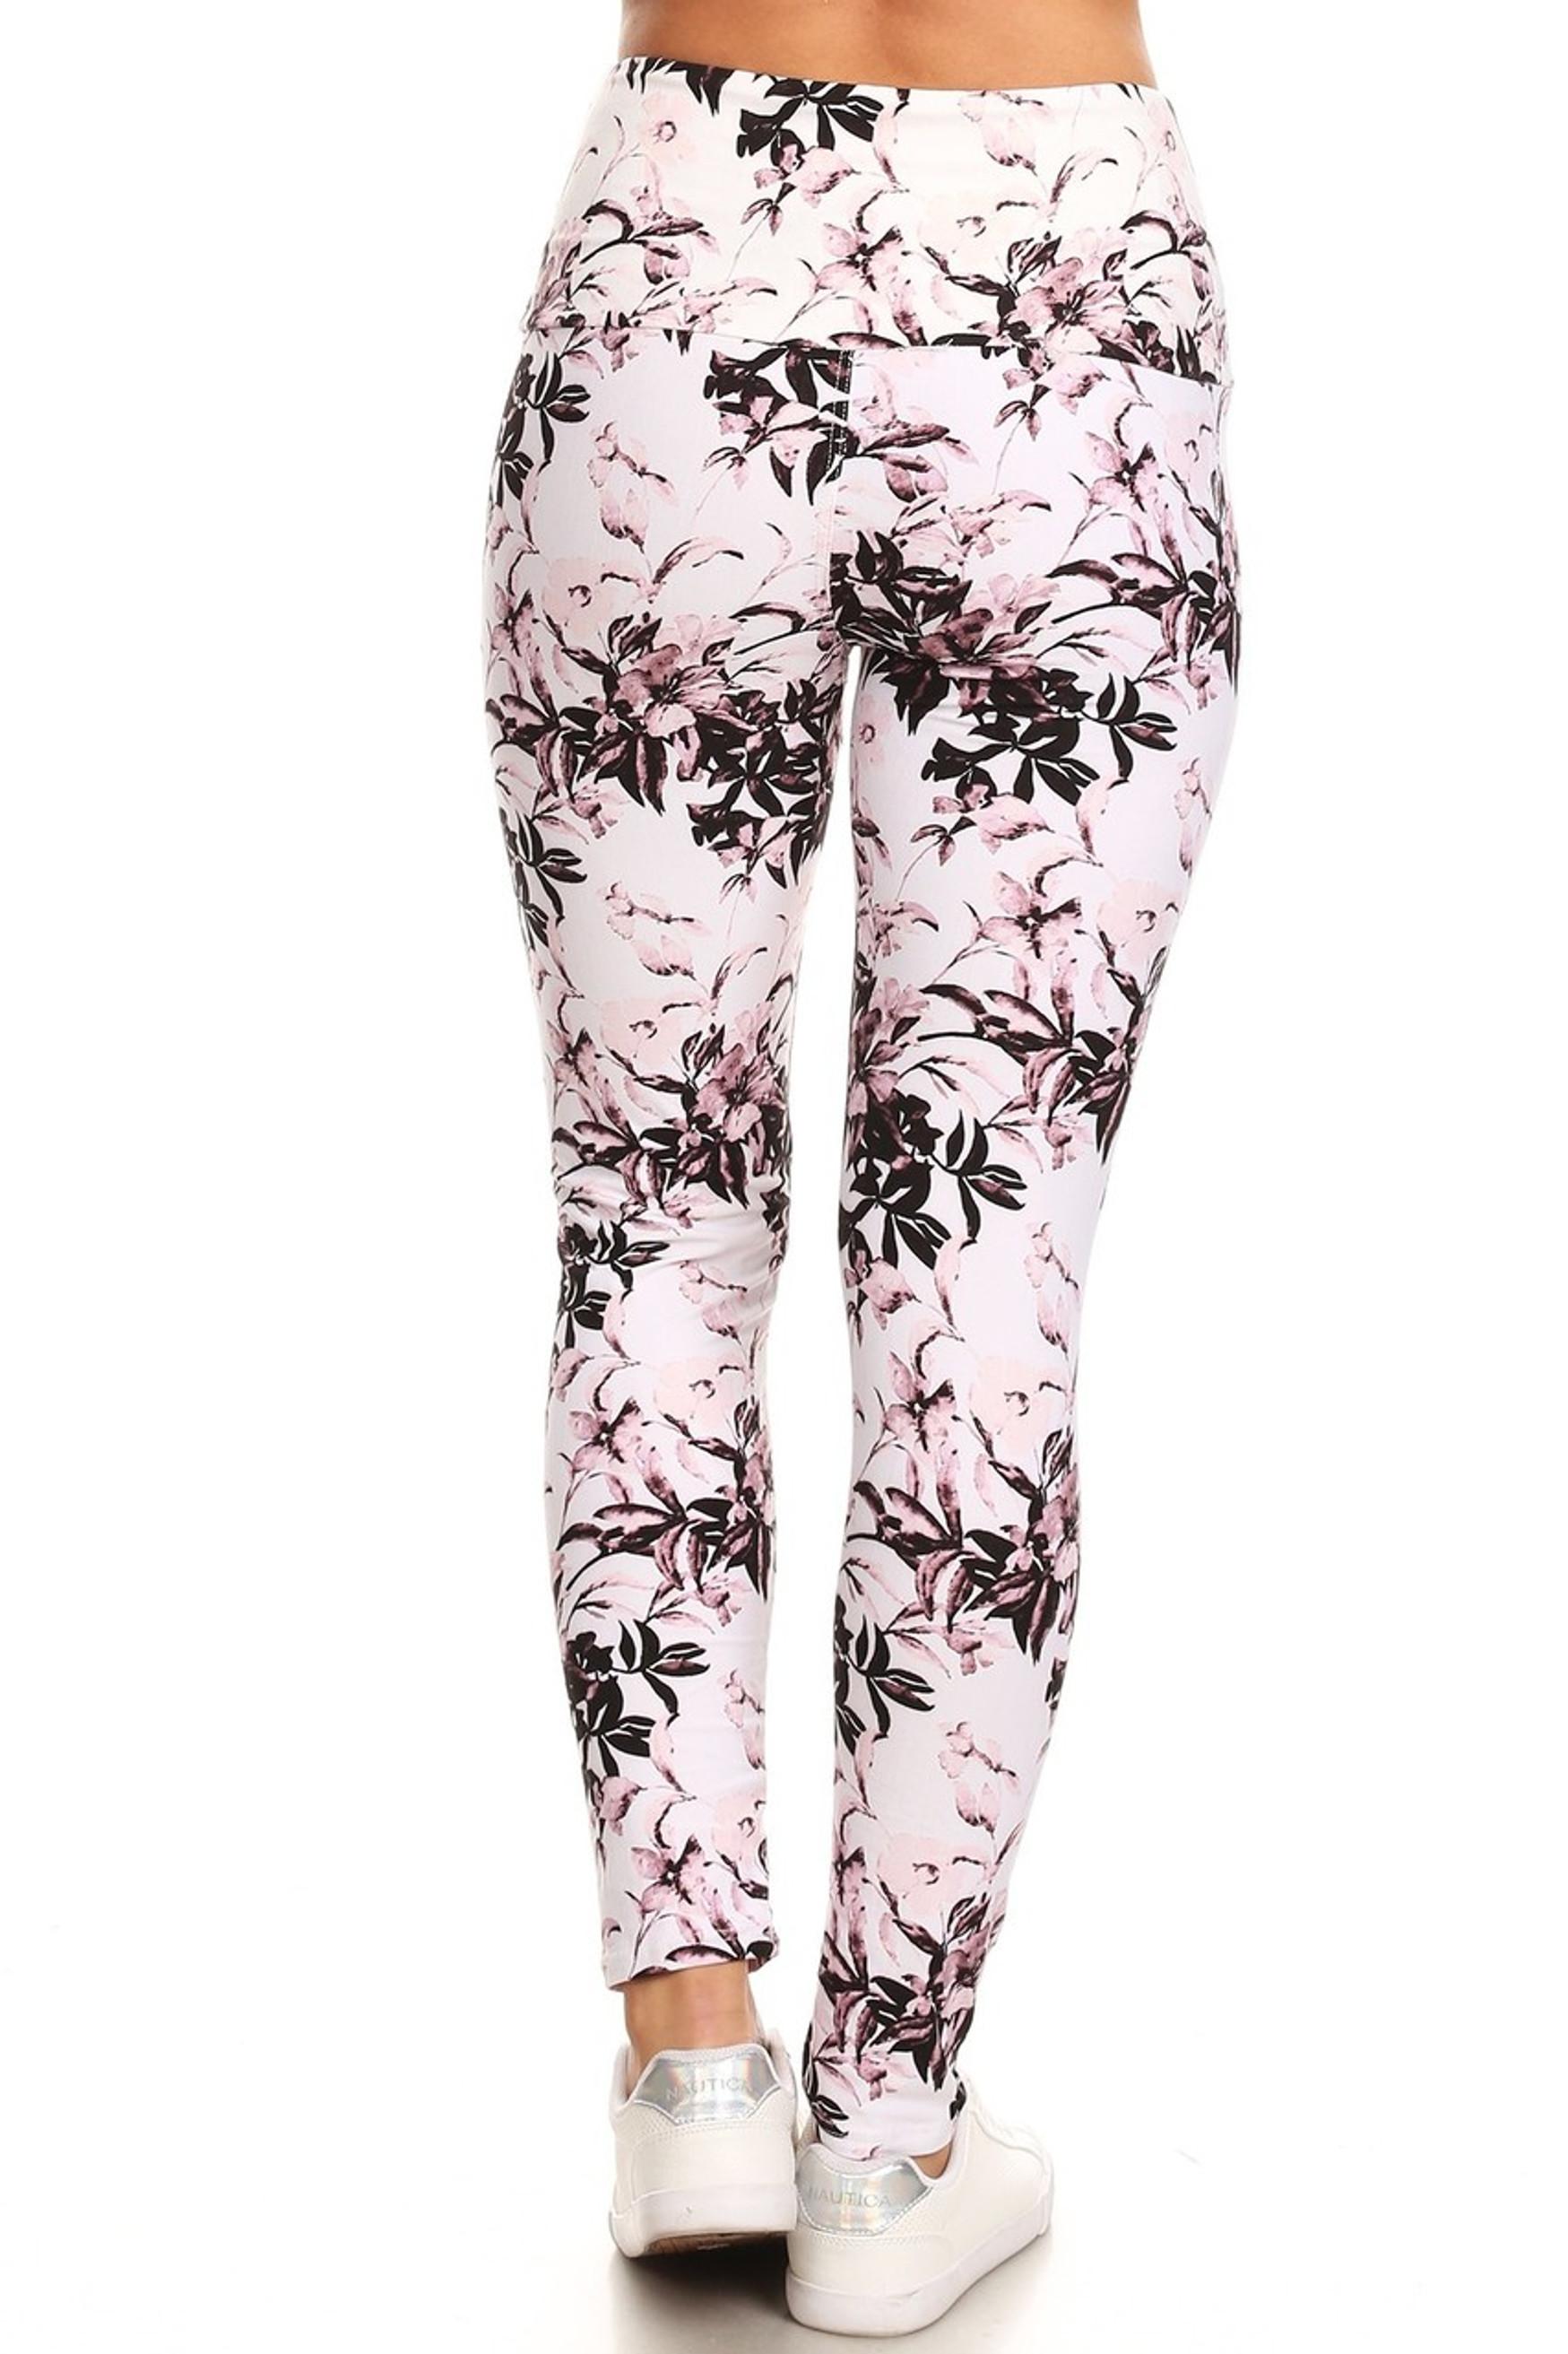 Brushed Pastel Blossom Bloom High Waist Leggings